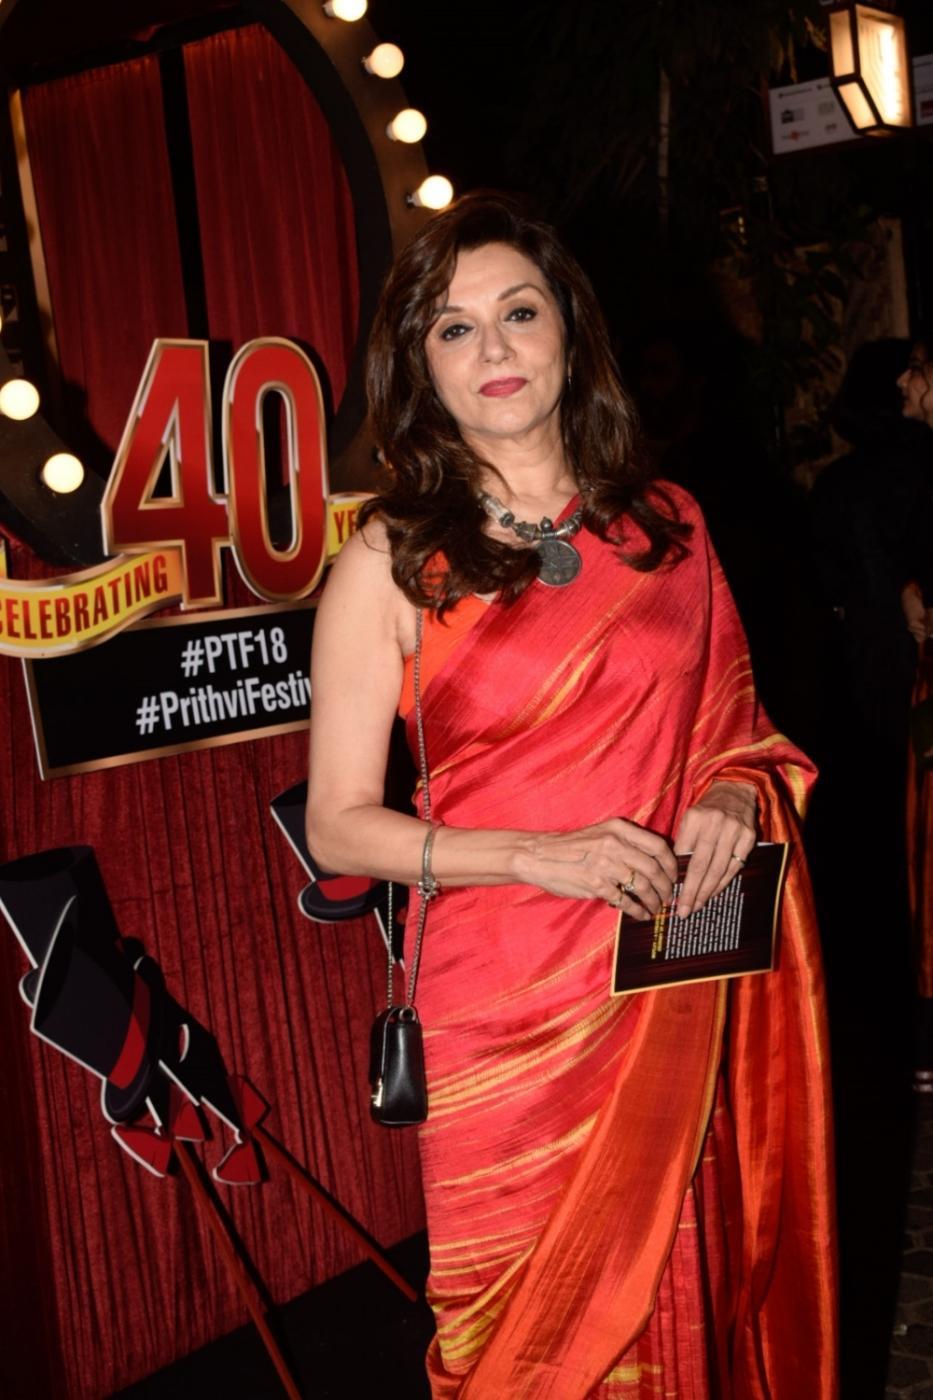 Mumbai: Actress Lillete Dubey at the 40th anniversary celebration of the Prithvi Theatre in Mumbai on Nov 5, 2018. (Photo: IANS) by .